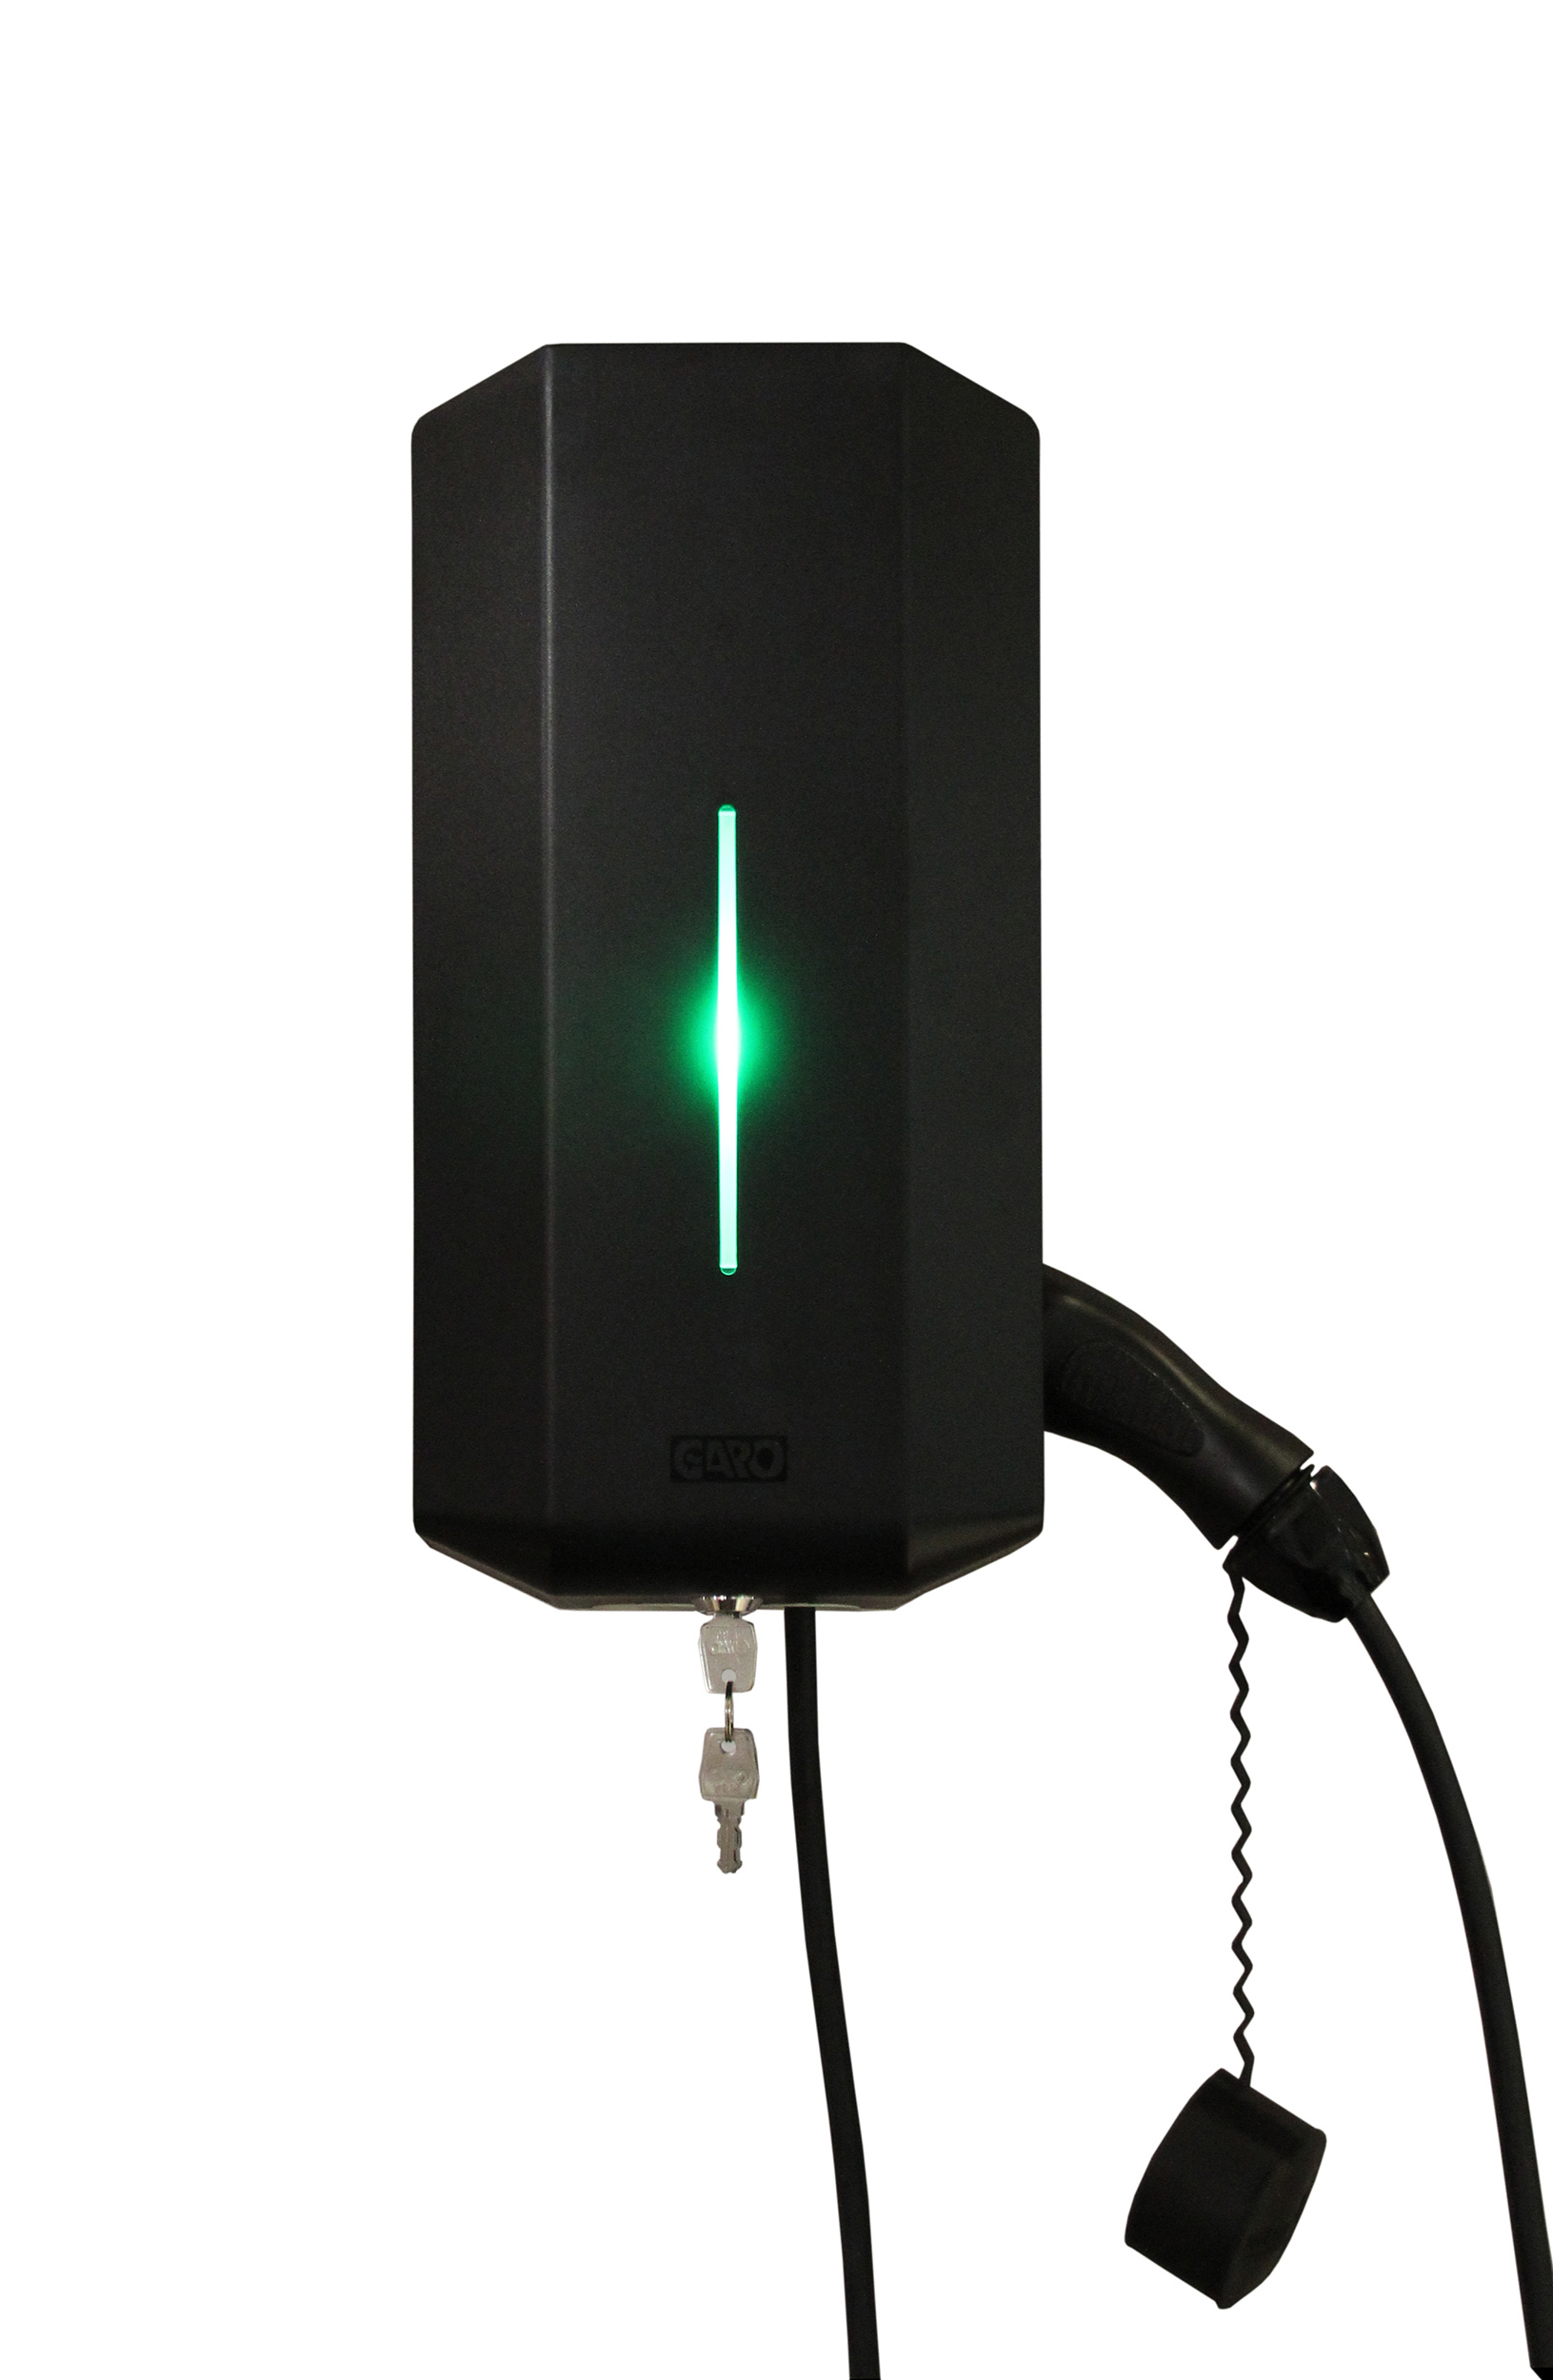 GLB 3,7 kW fast kabel Typ 1